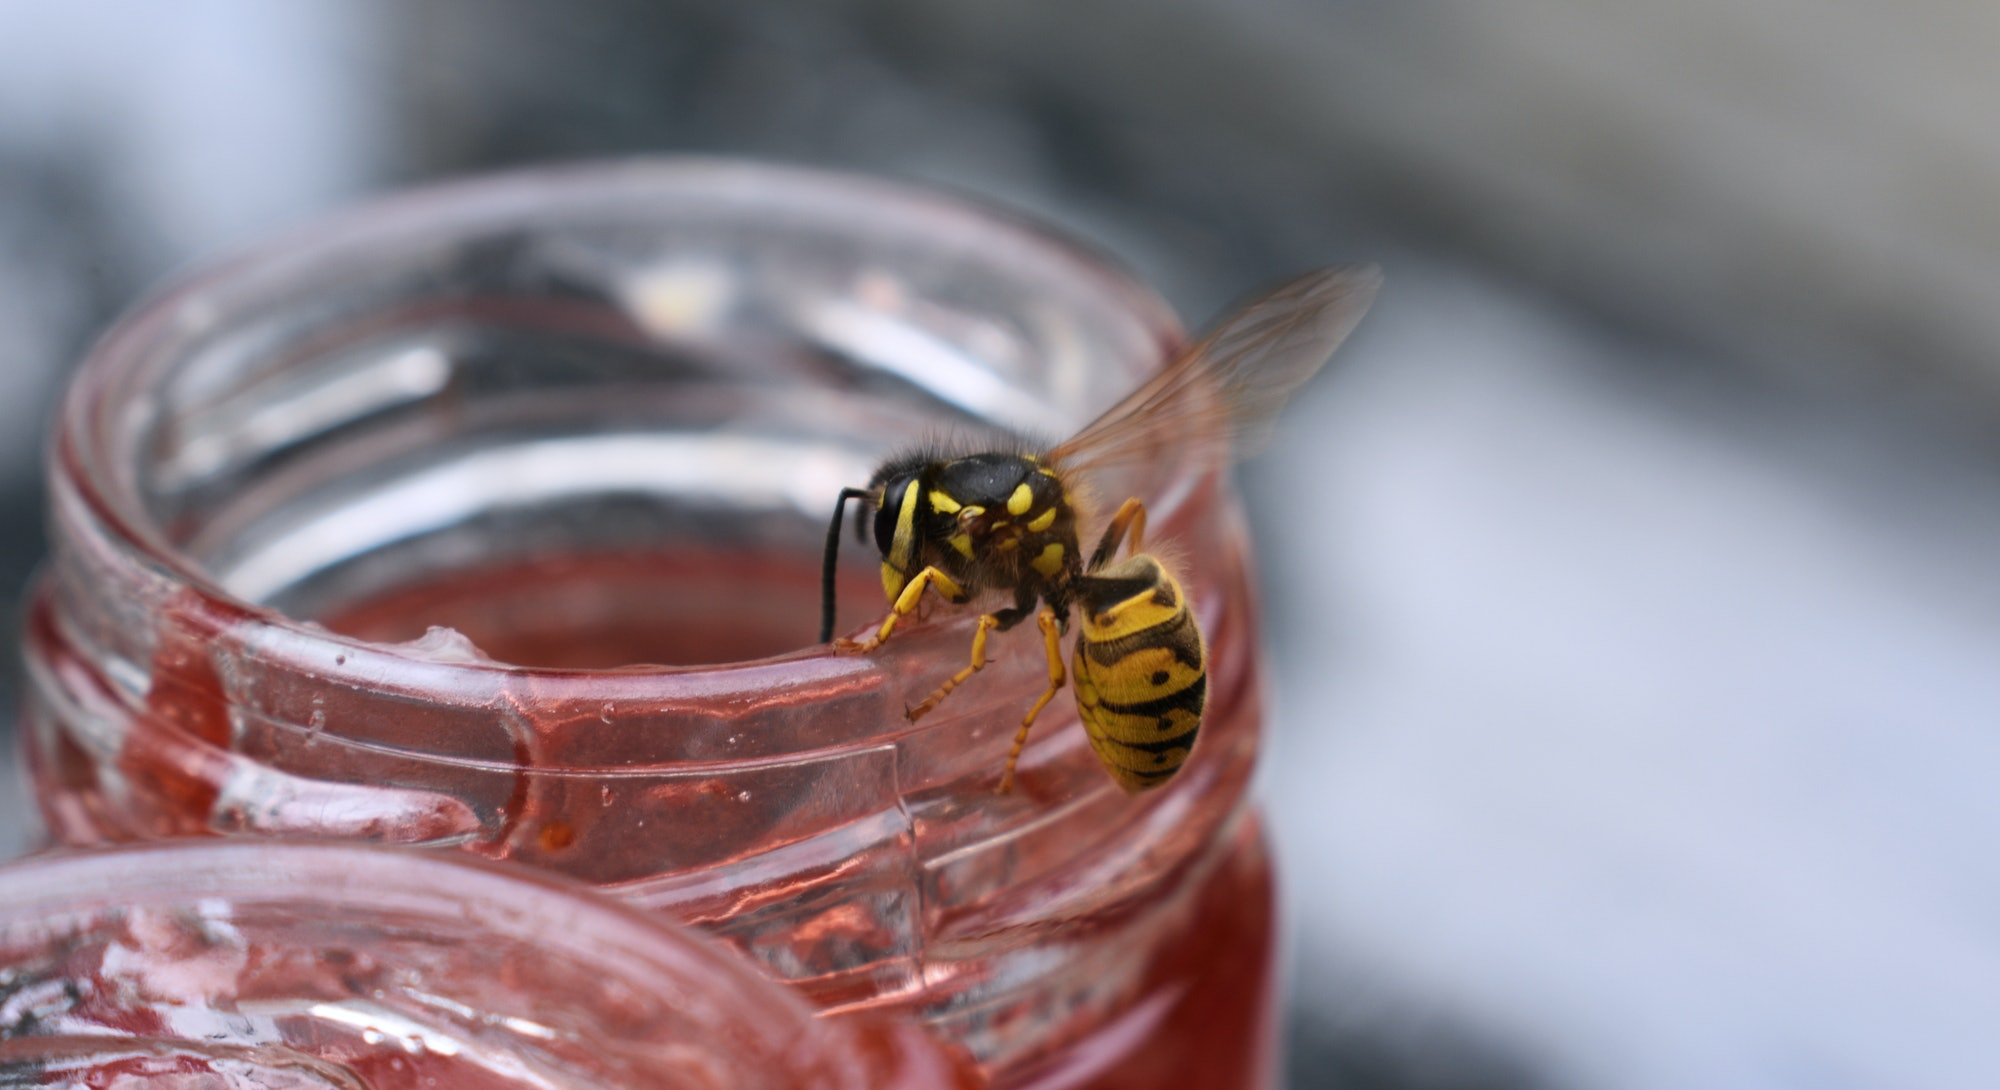 Wasp eating jam